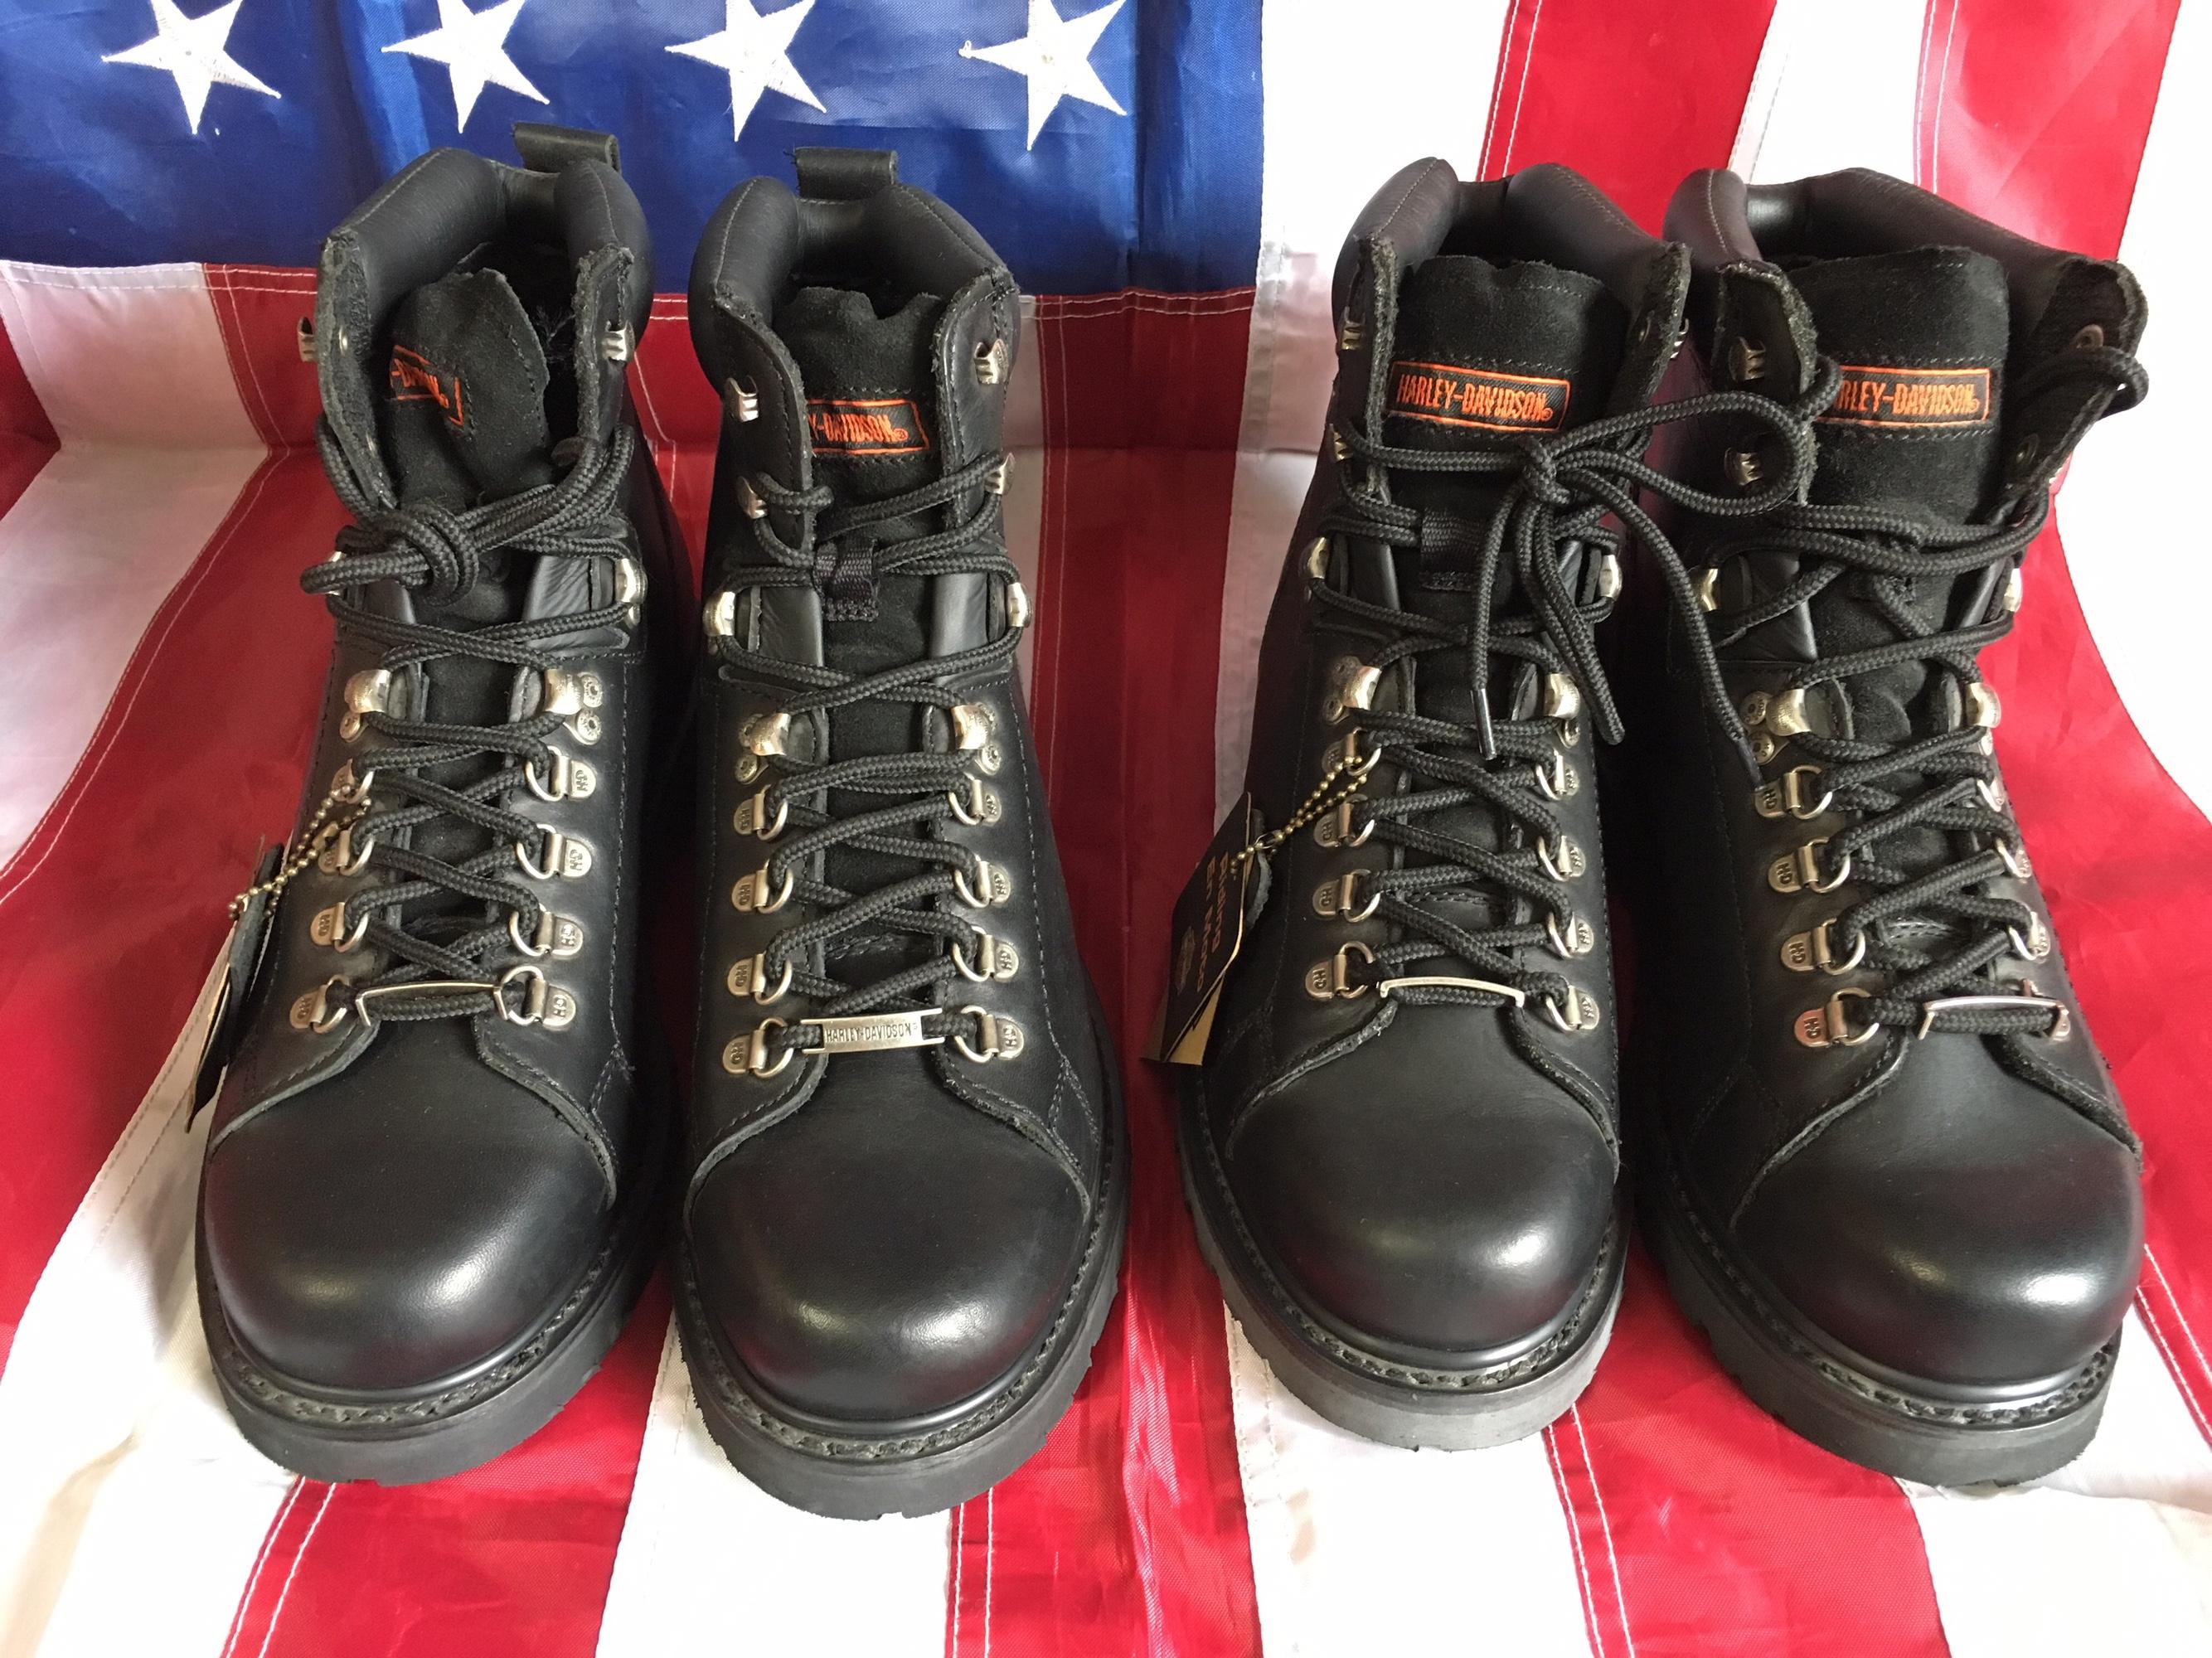 哈雷 HARLEY-DAVIDSON 摩托靴 工作靴 全新